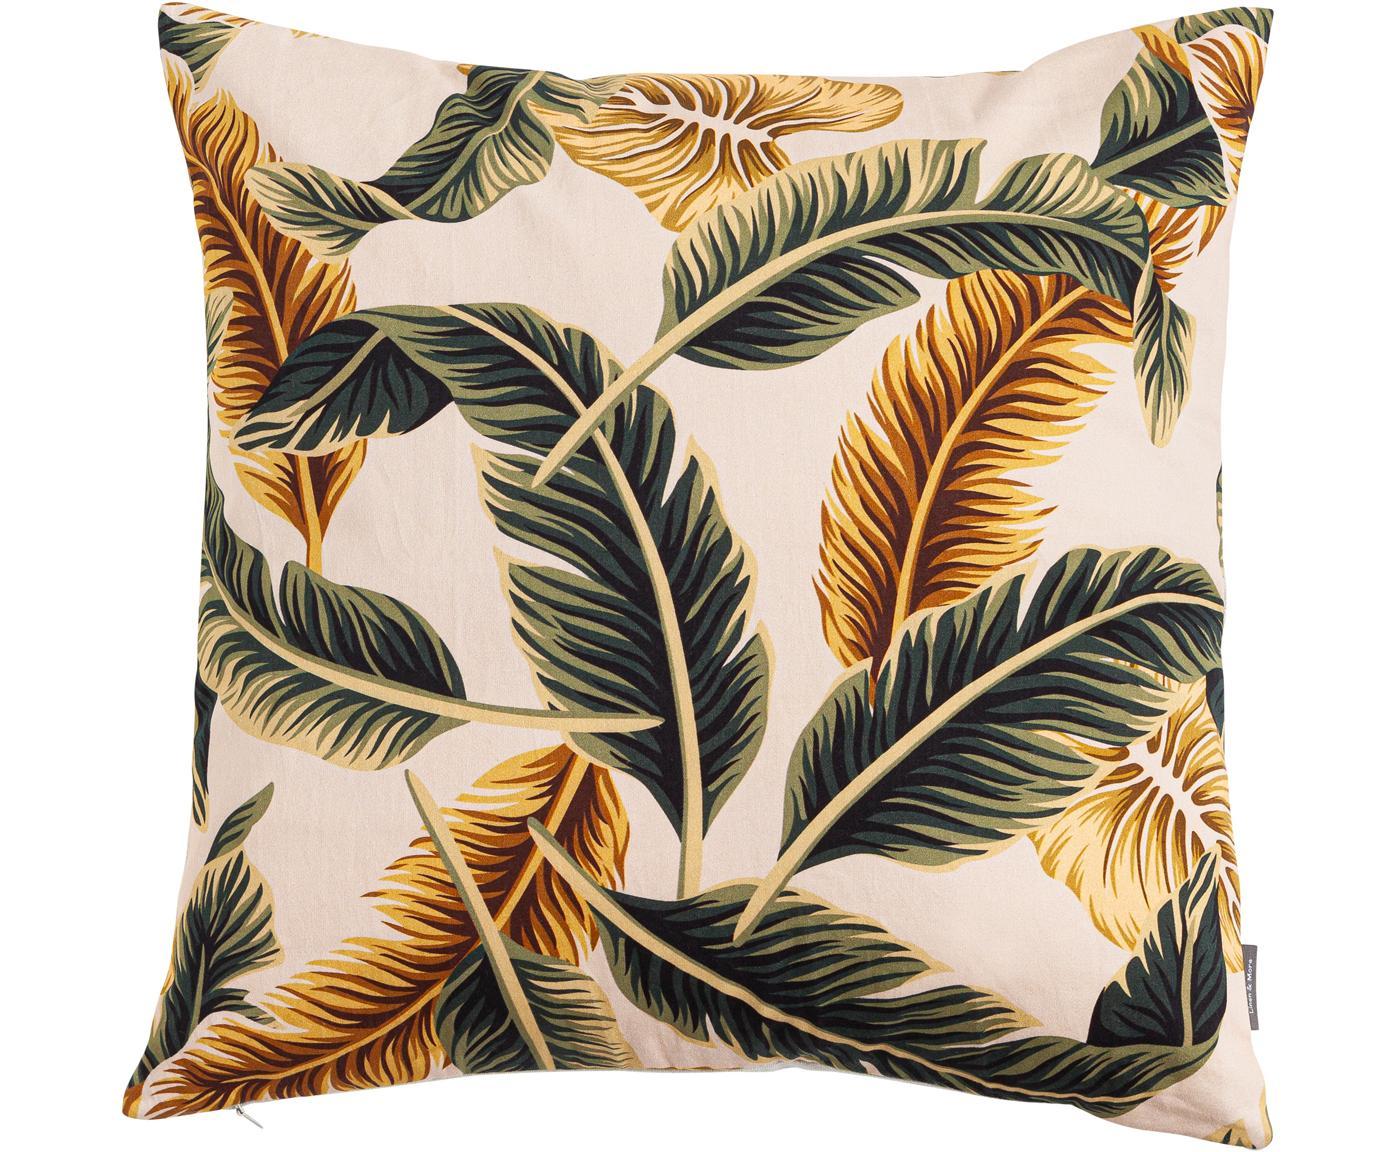 Cuscino con imbottitura Elegant Feather, Cotone, Beige, verde, giallo dorato, Larg. 45 x Lung. 45 cm